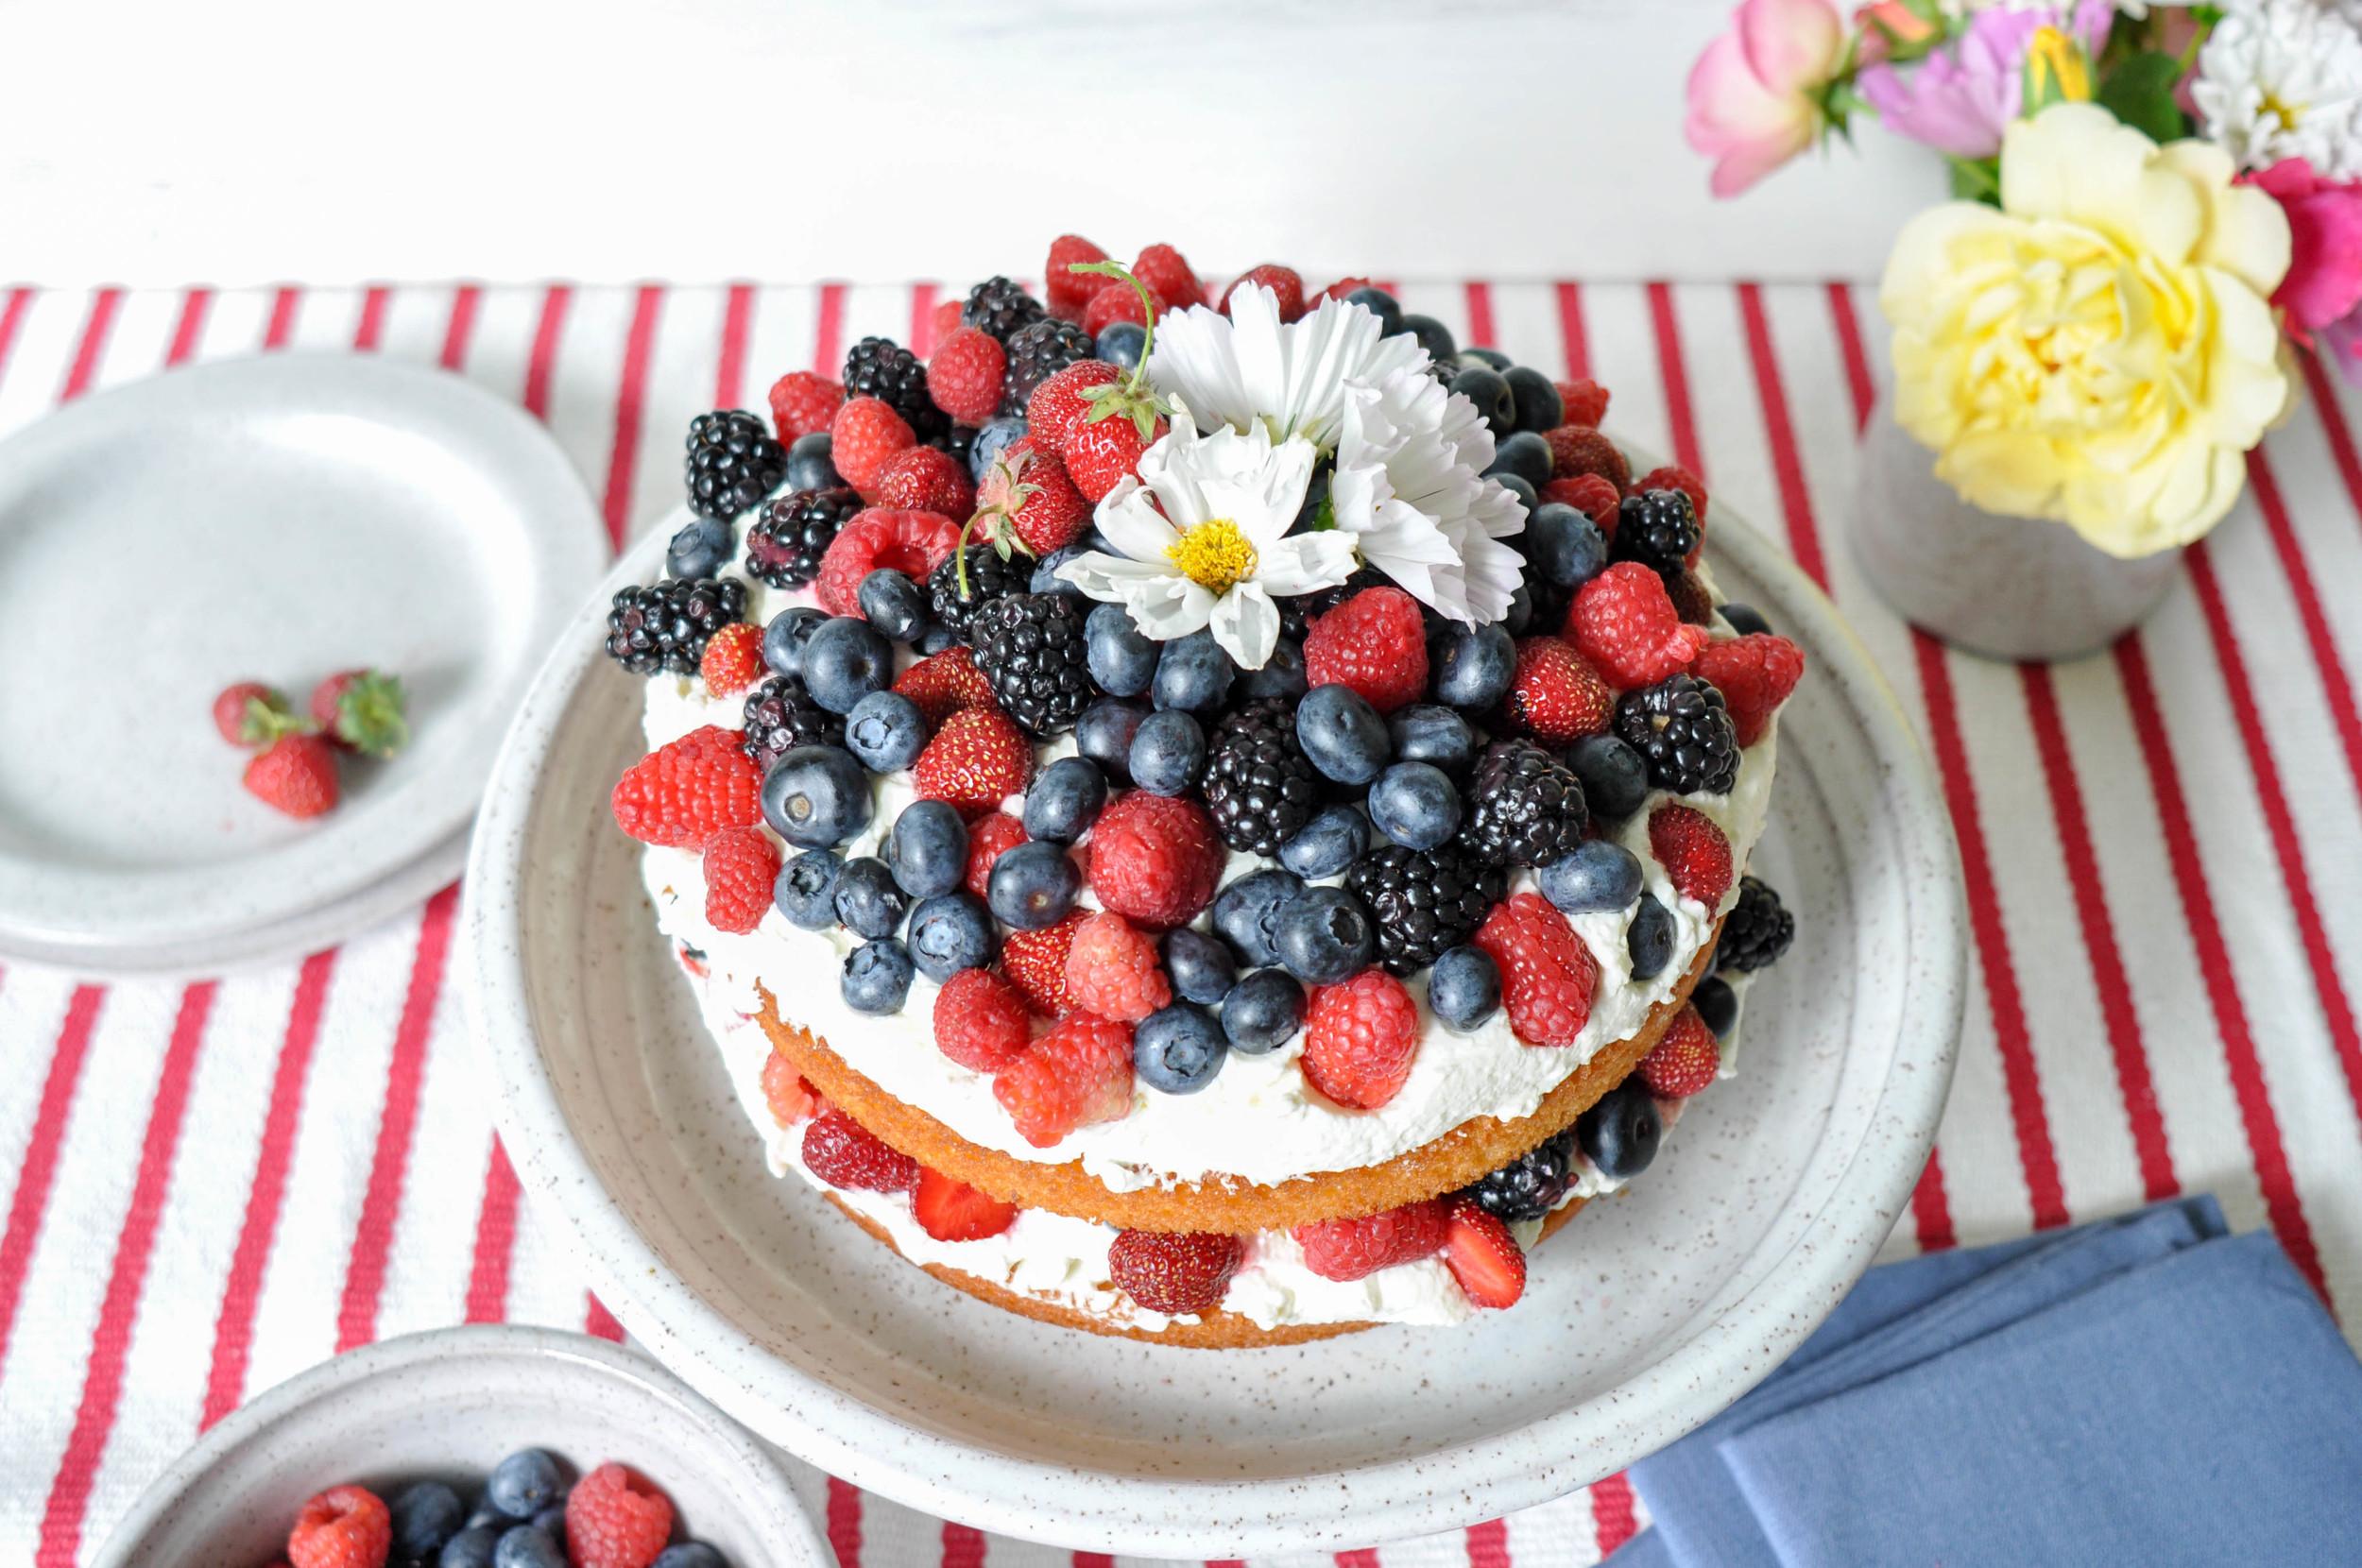 lemon-cake-naked-berries-fourth-of-july-cake-stand-white